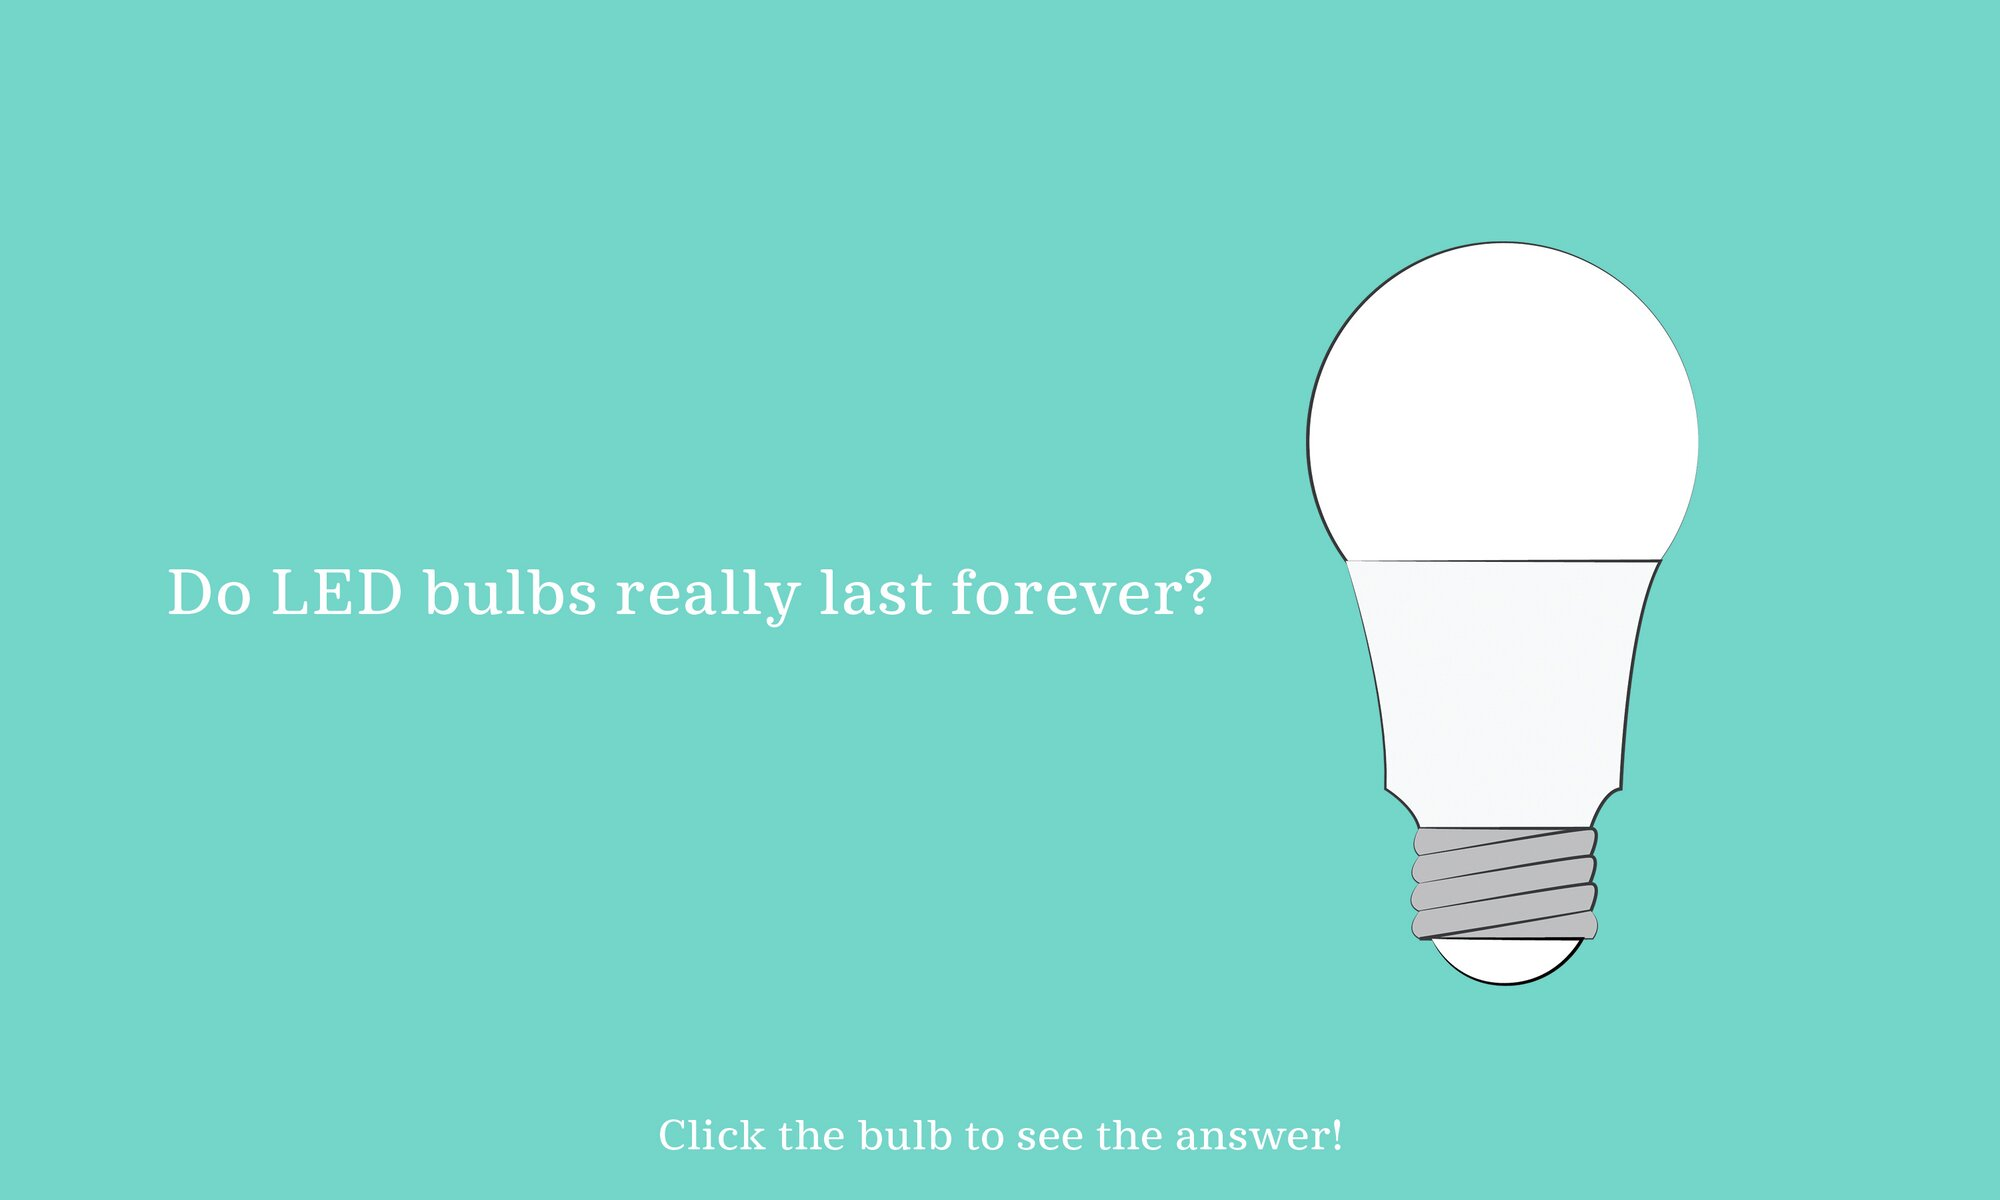 LEDs last longer than other bulbs